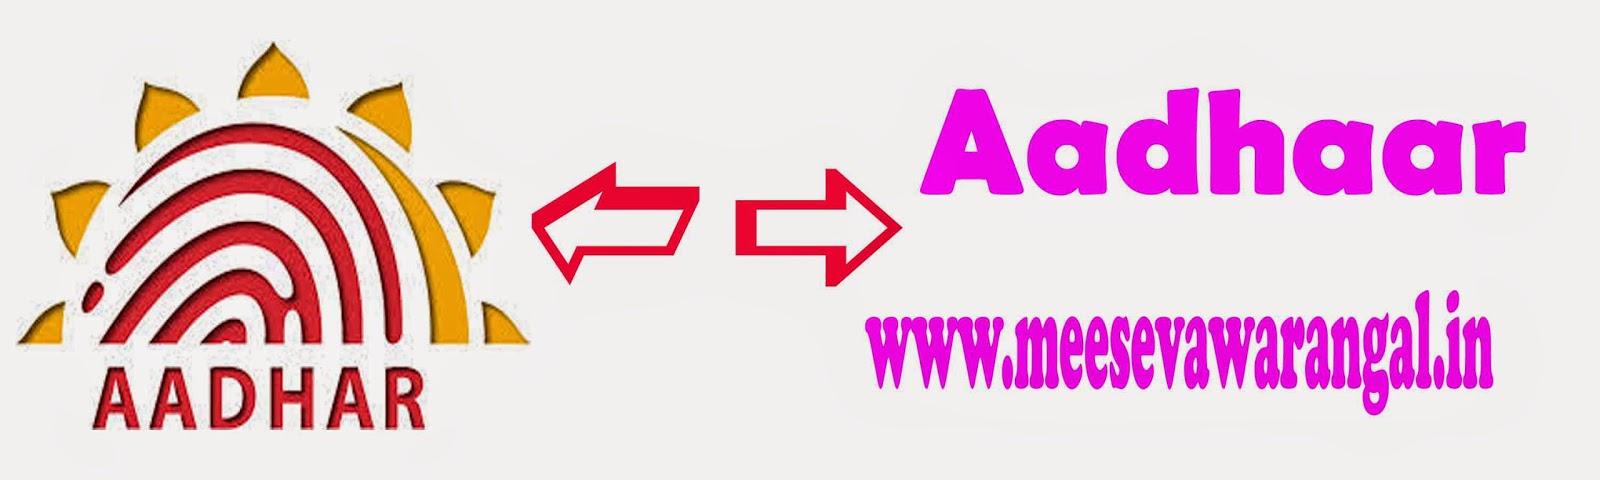 Aadhar Card Number Is Mandatory In Vehicle Registrations / RTO Registrations